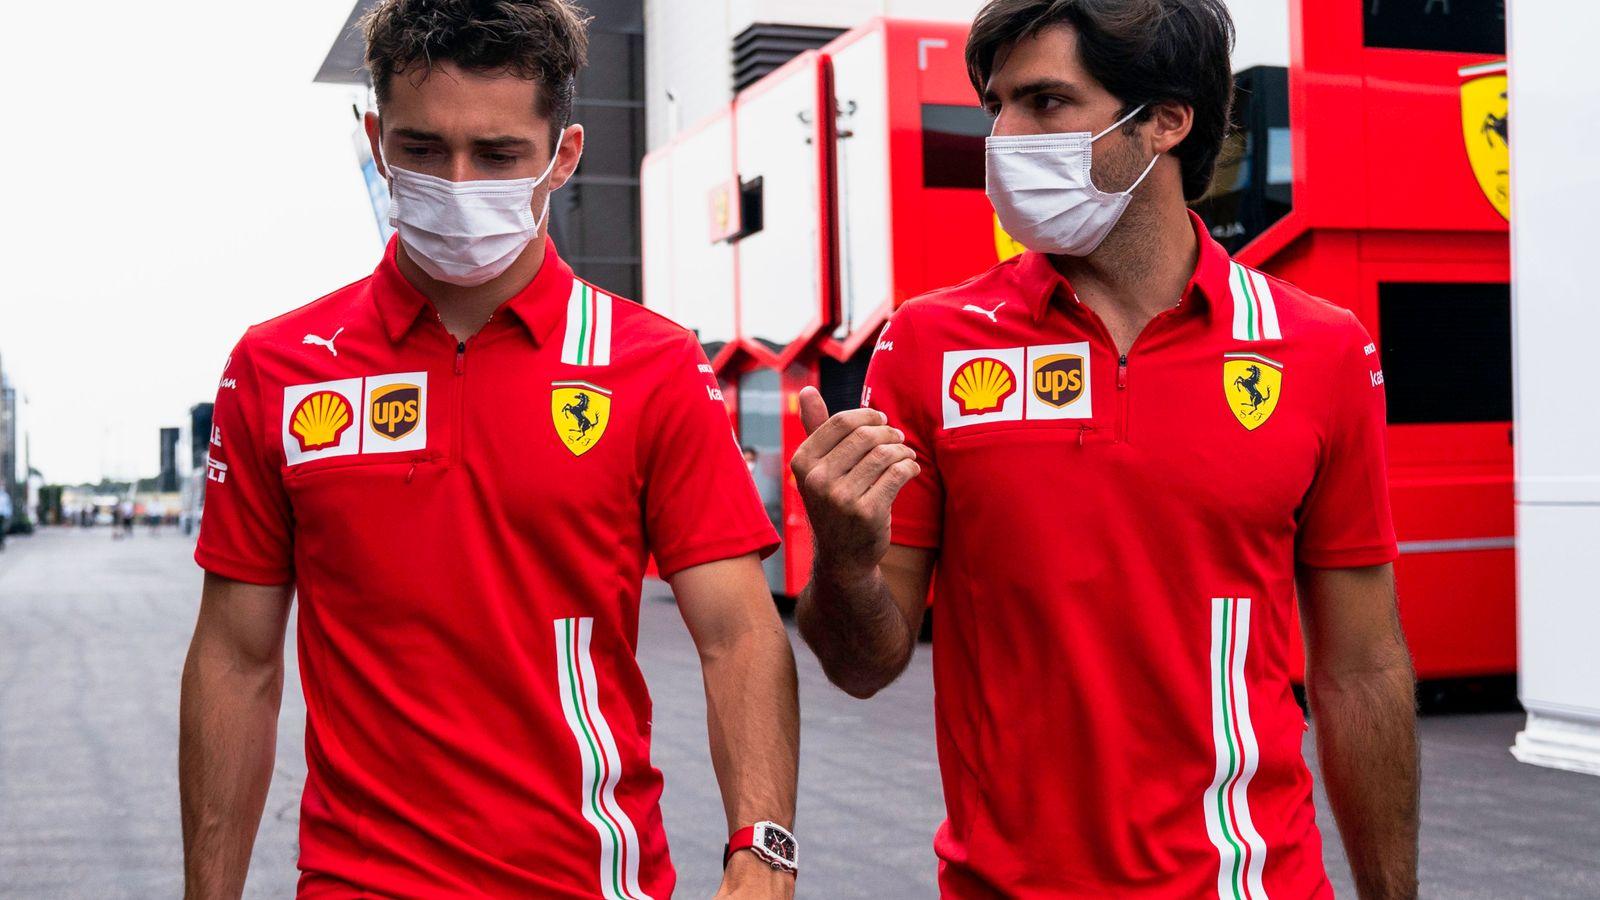 French GP: Carlos Sainz and Charles Leclerc explain Ferrari setback as McLaren move ahead in key F1 fight